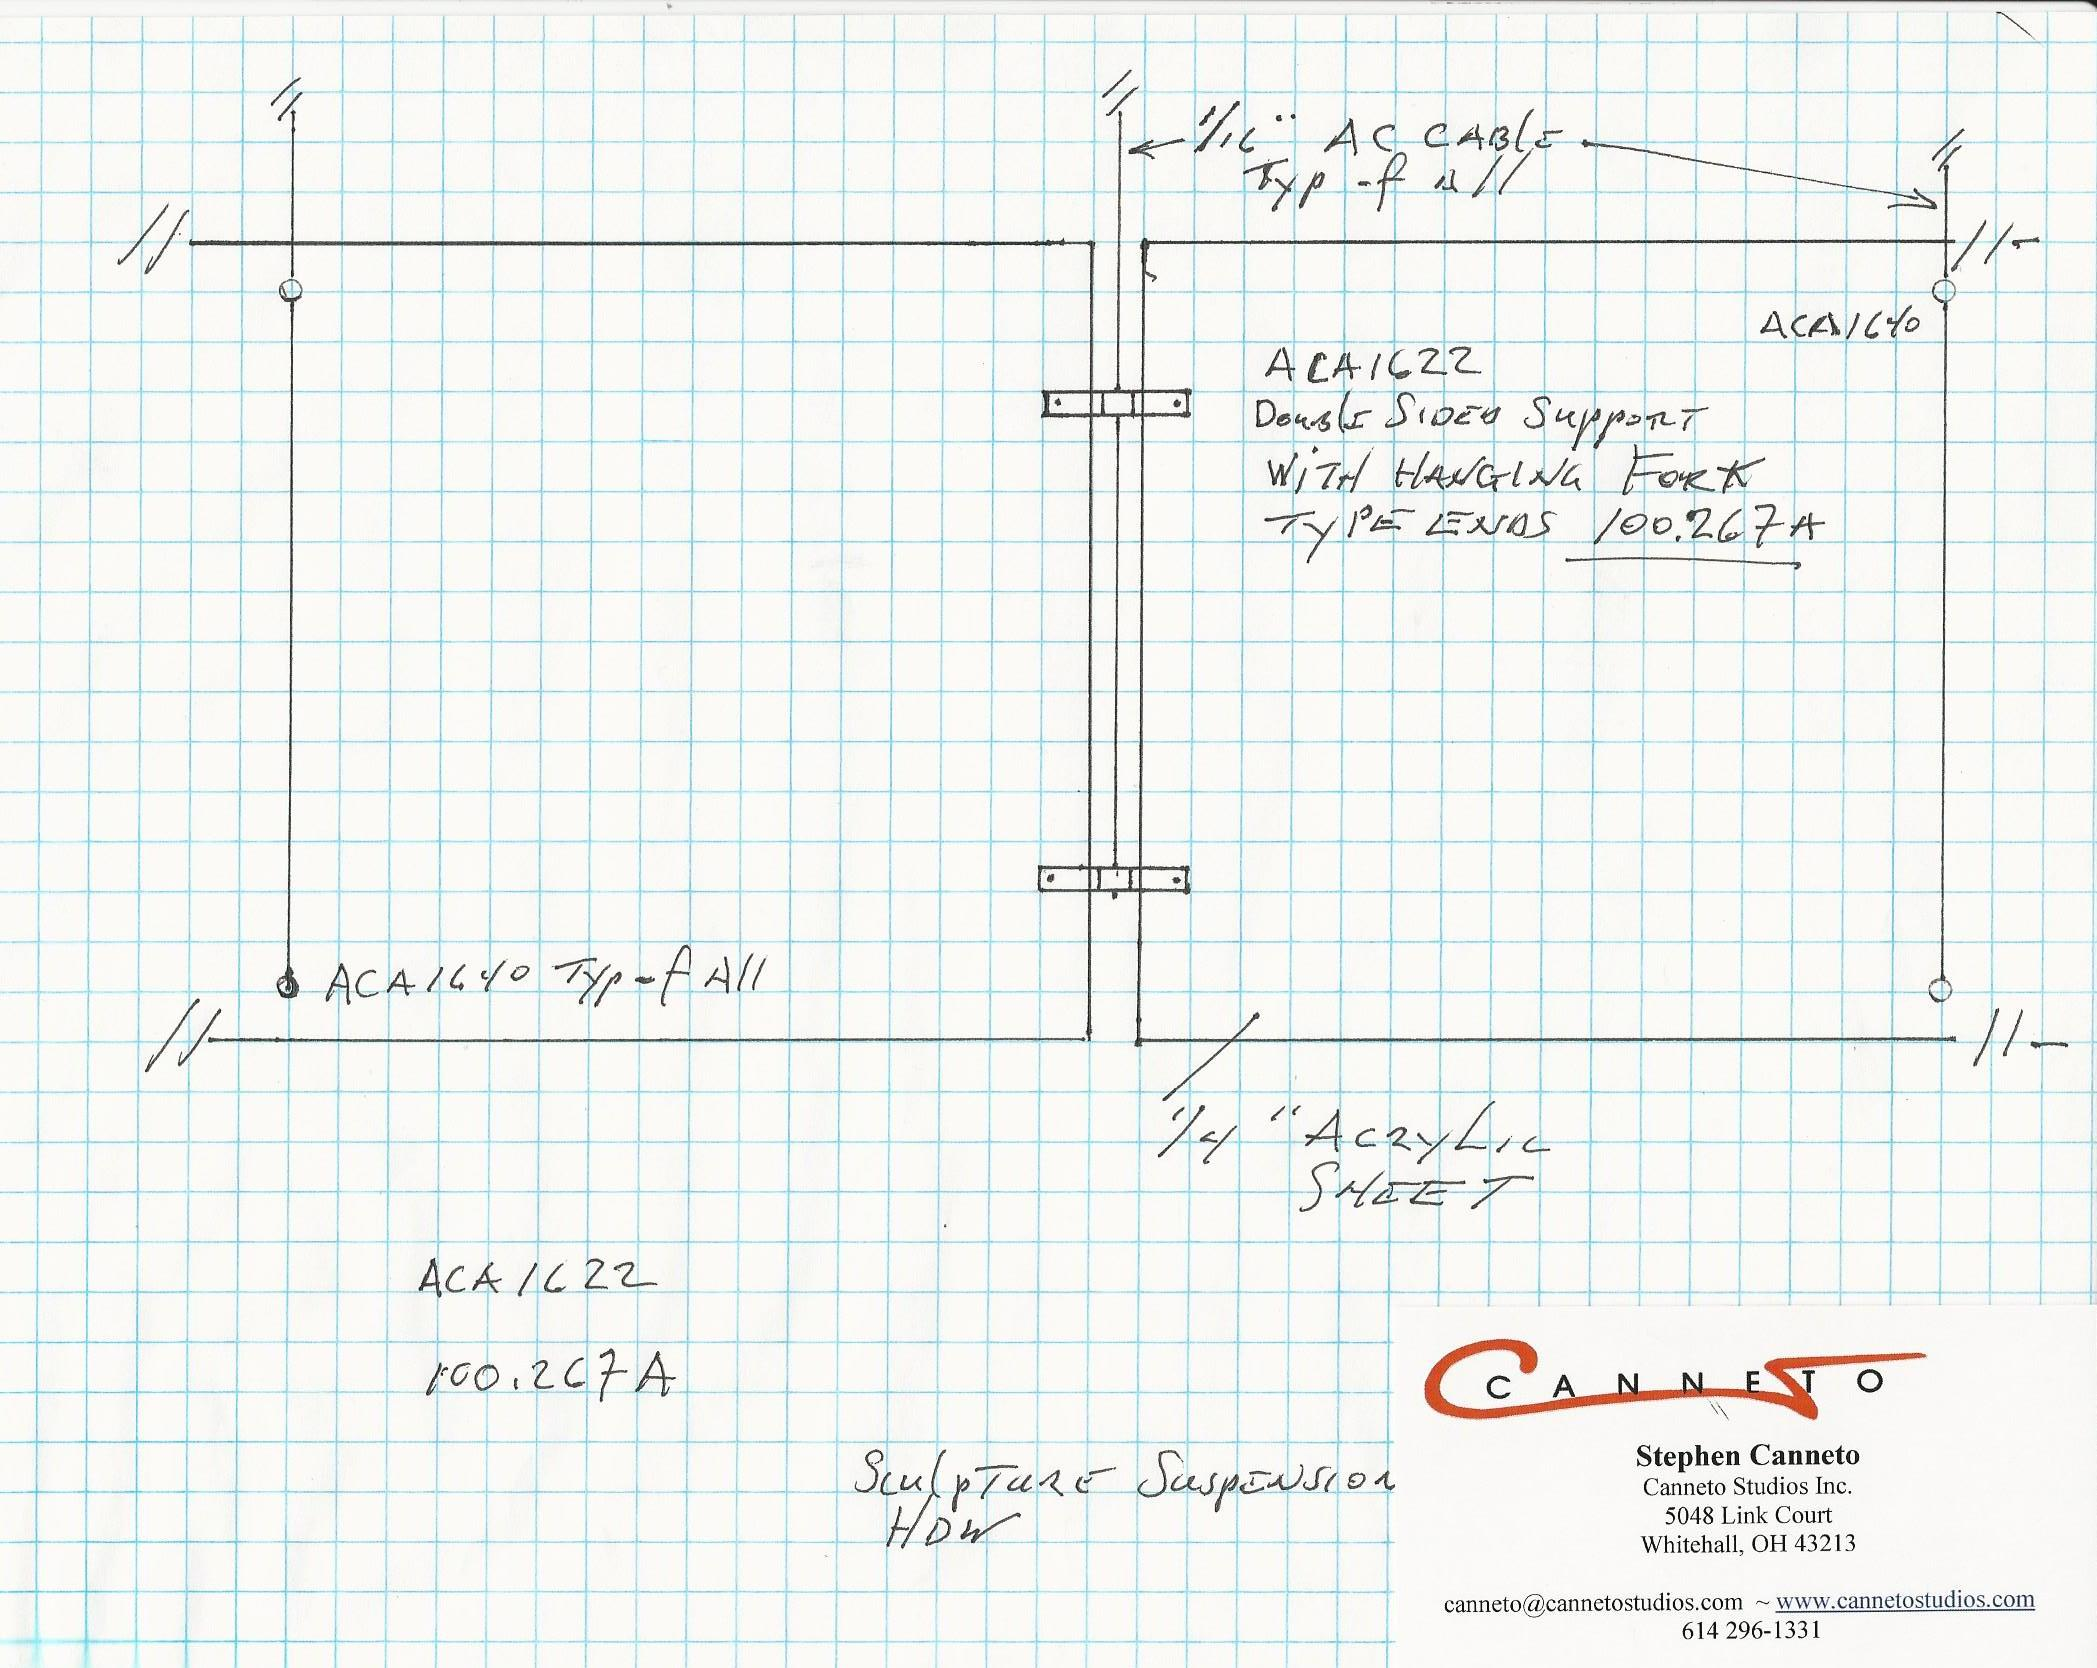 Sculpture Suspension Parts.jpg